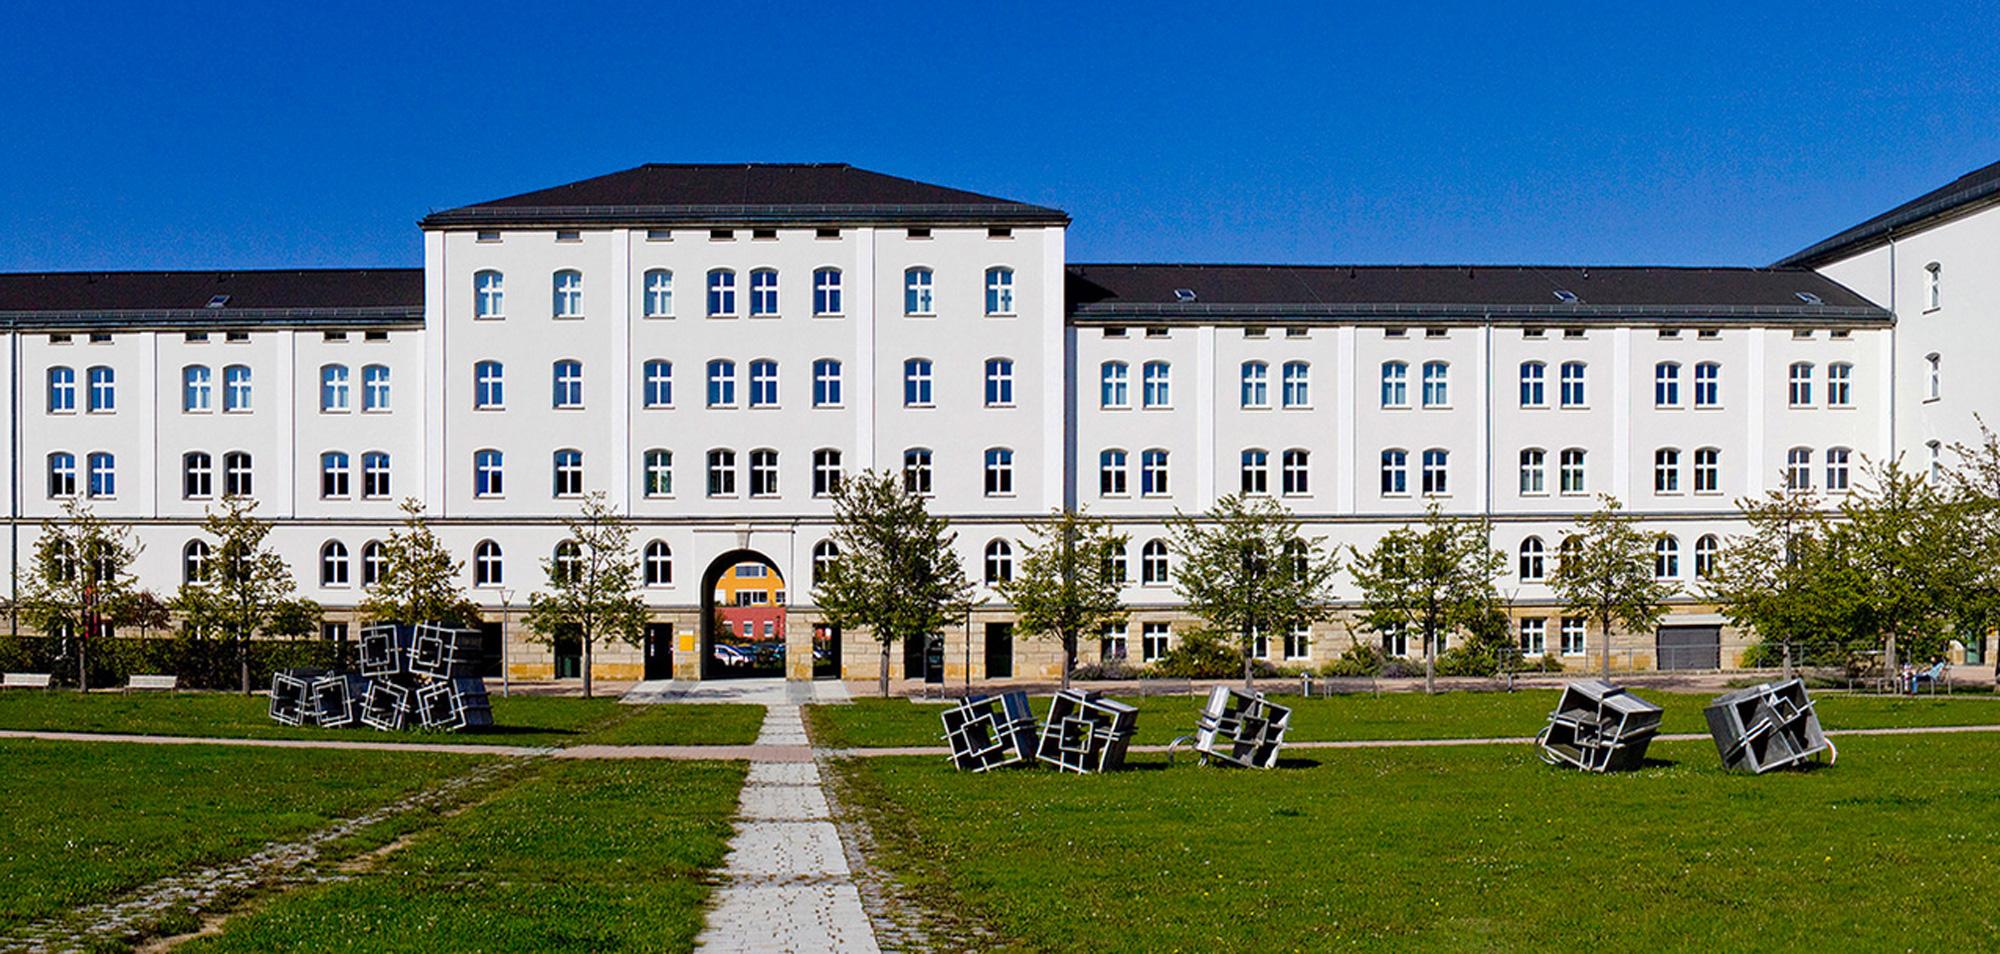 Morphing i sabine straub - Architekt amberg ...